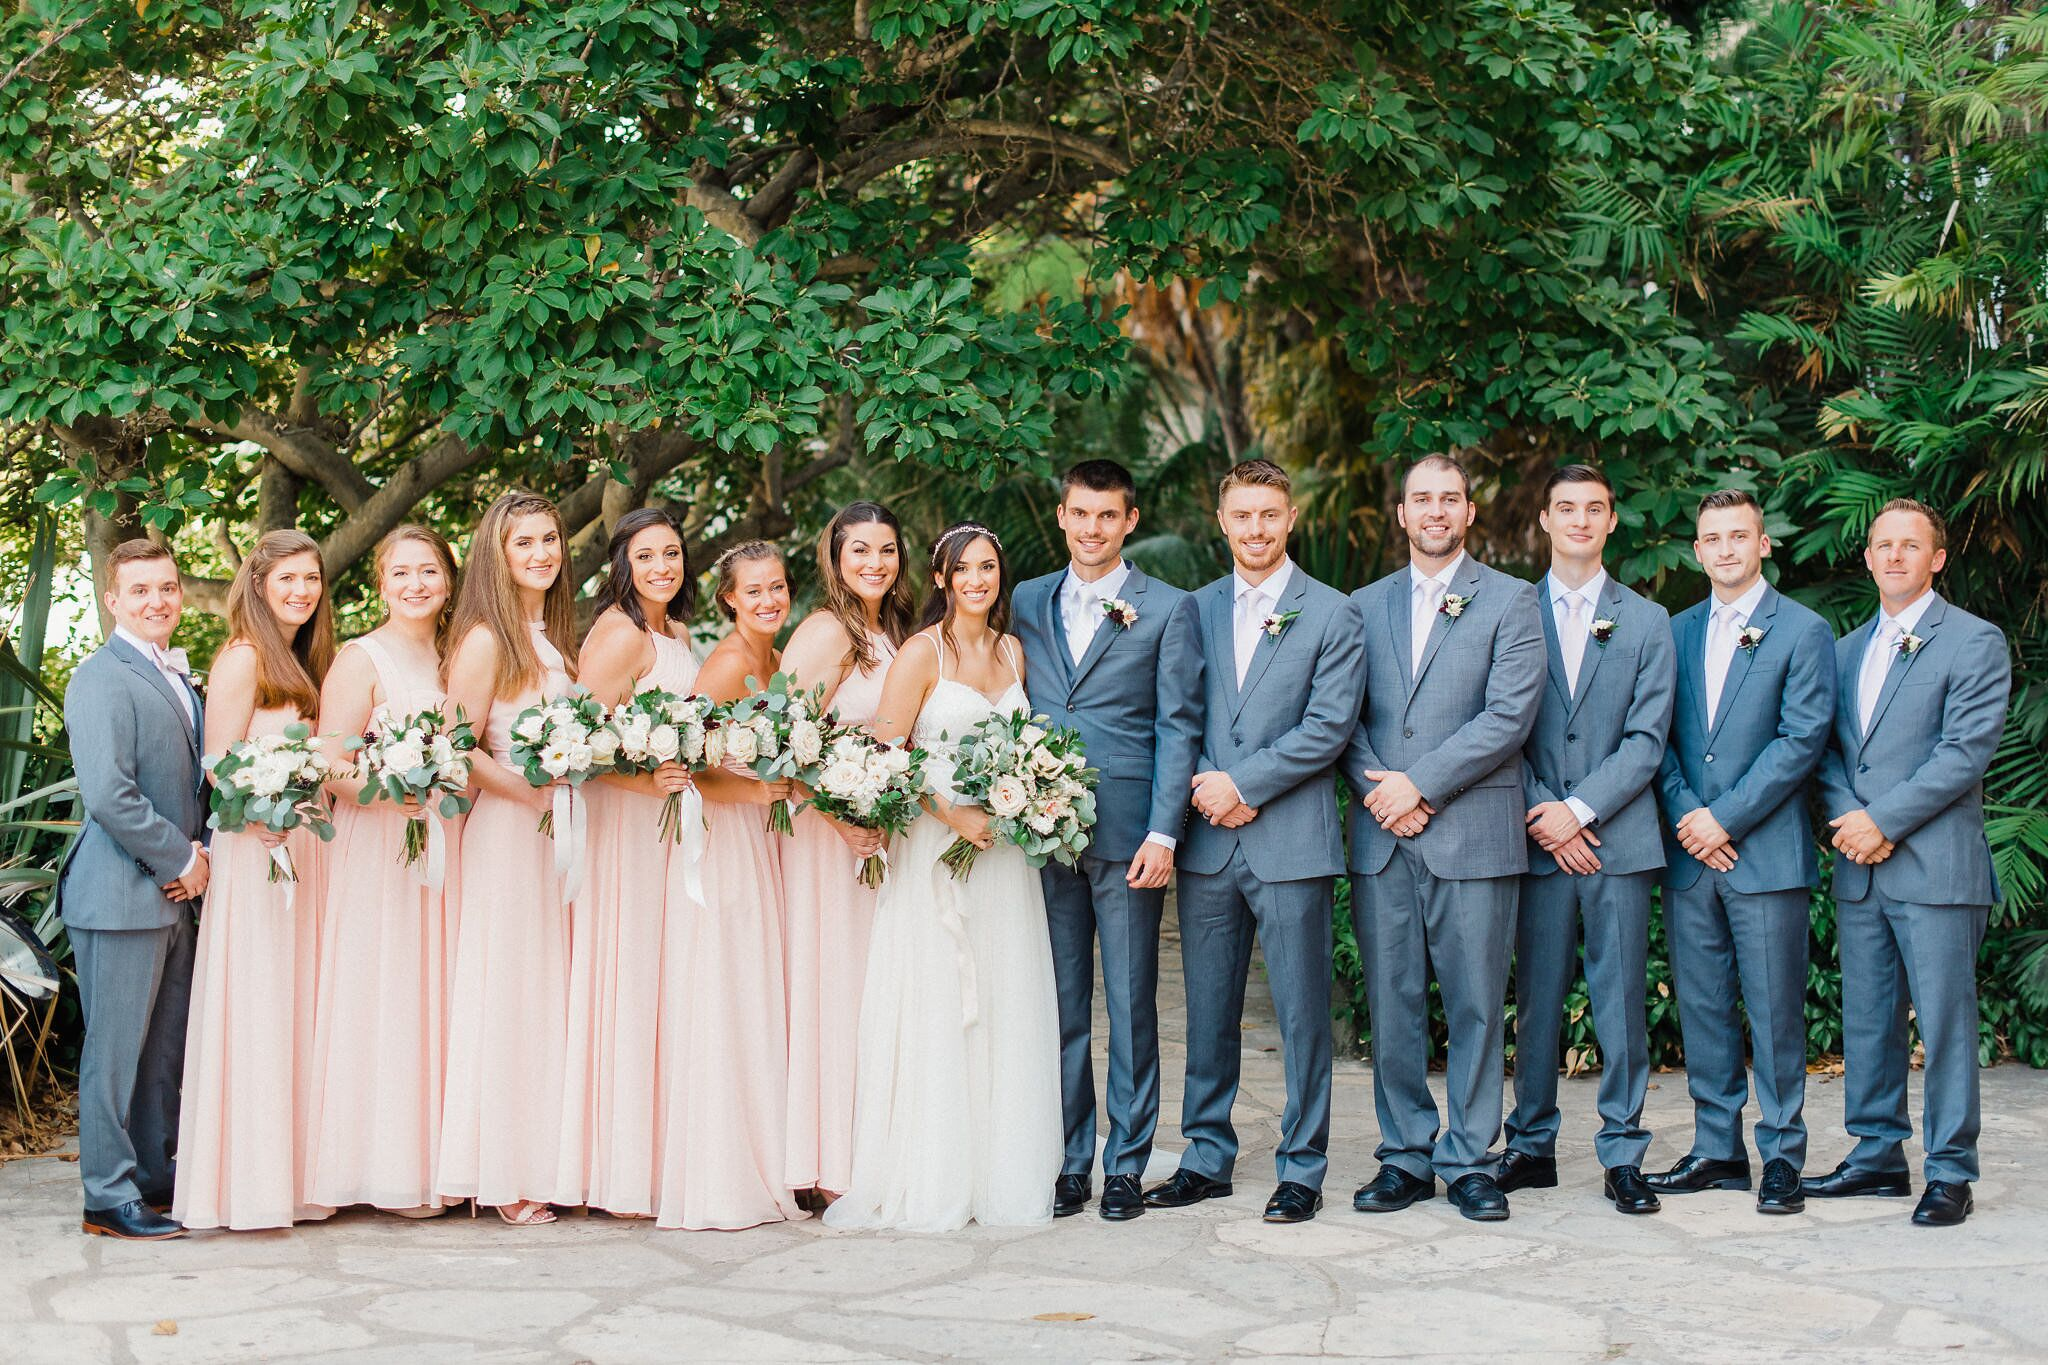 www.santabarbaraweddings.com | Photographer: Grace Kathryn | Venues: Villa & Vine, Santa Barbara Courthouse, Hilton Santa Barbara Resort | Coordination: Burlap & Bordeaux | Wedding Party